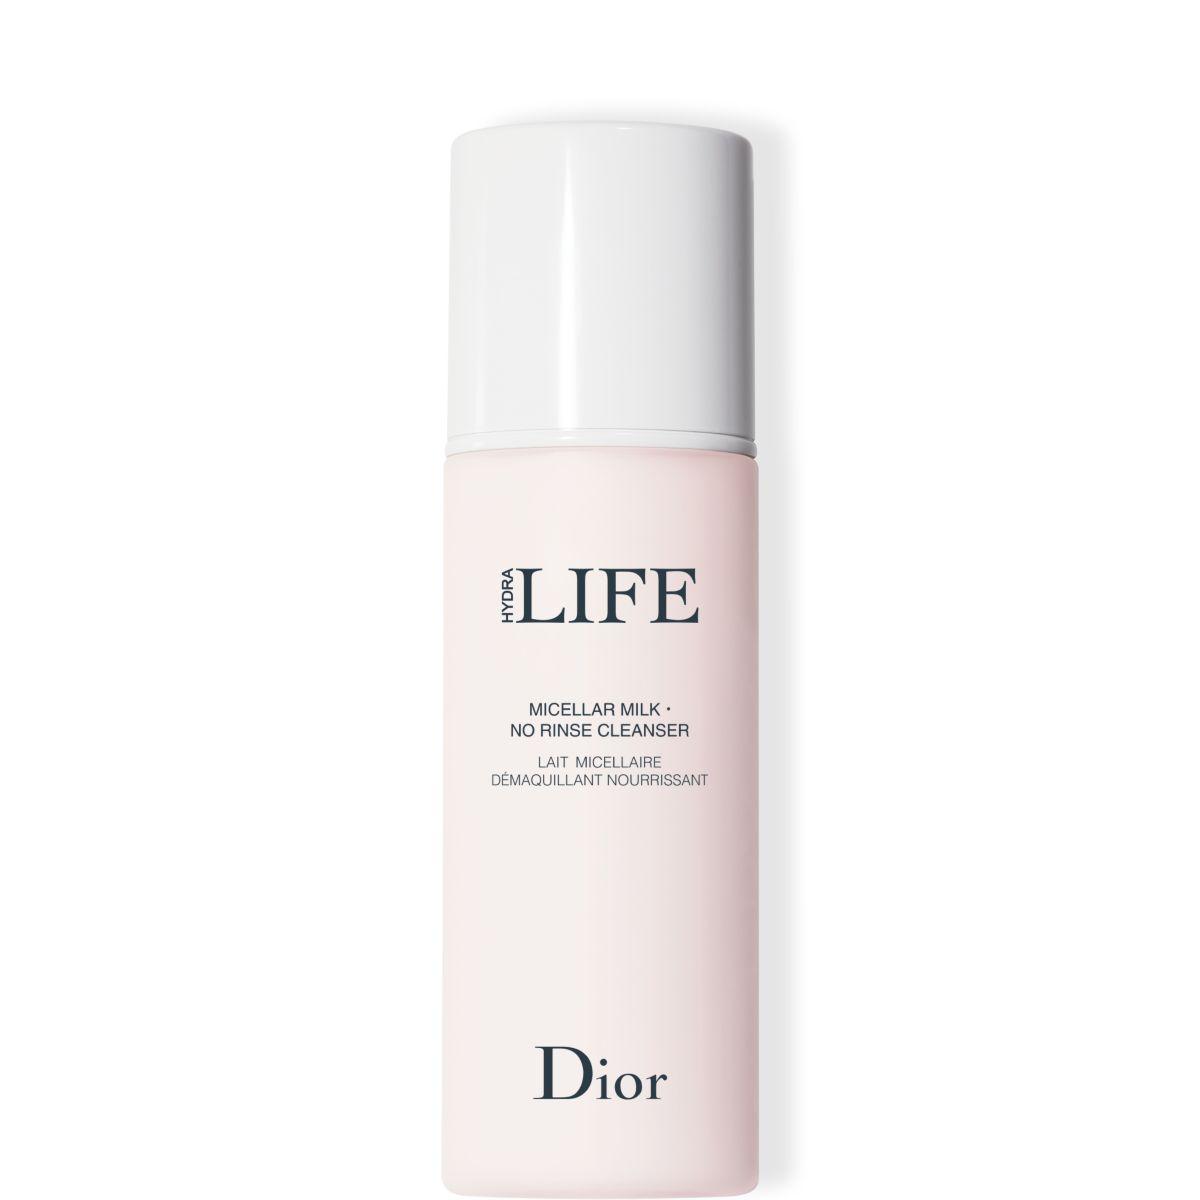 Dior - Dior Hydra Life - Lait Micellaire Démaquillant Nourrissant - 200 ml